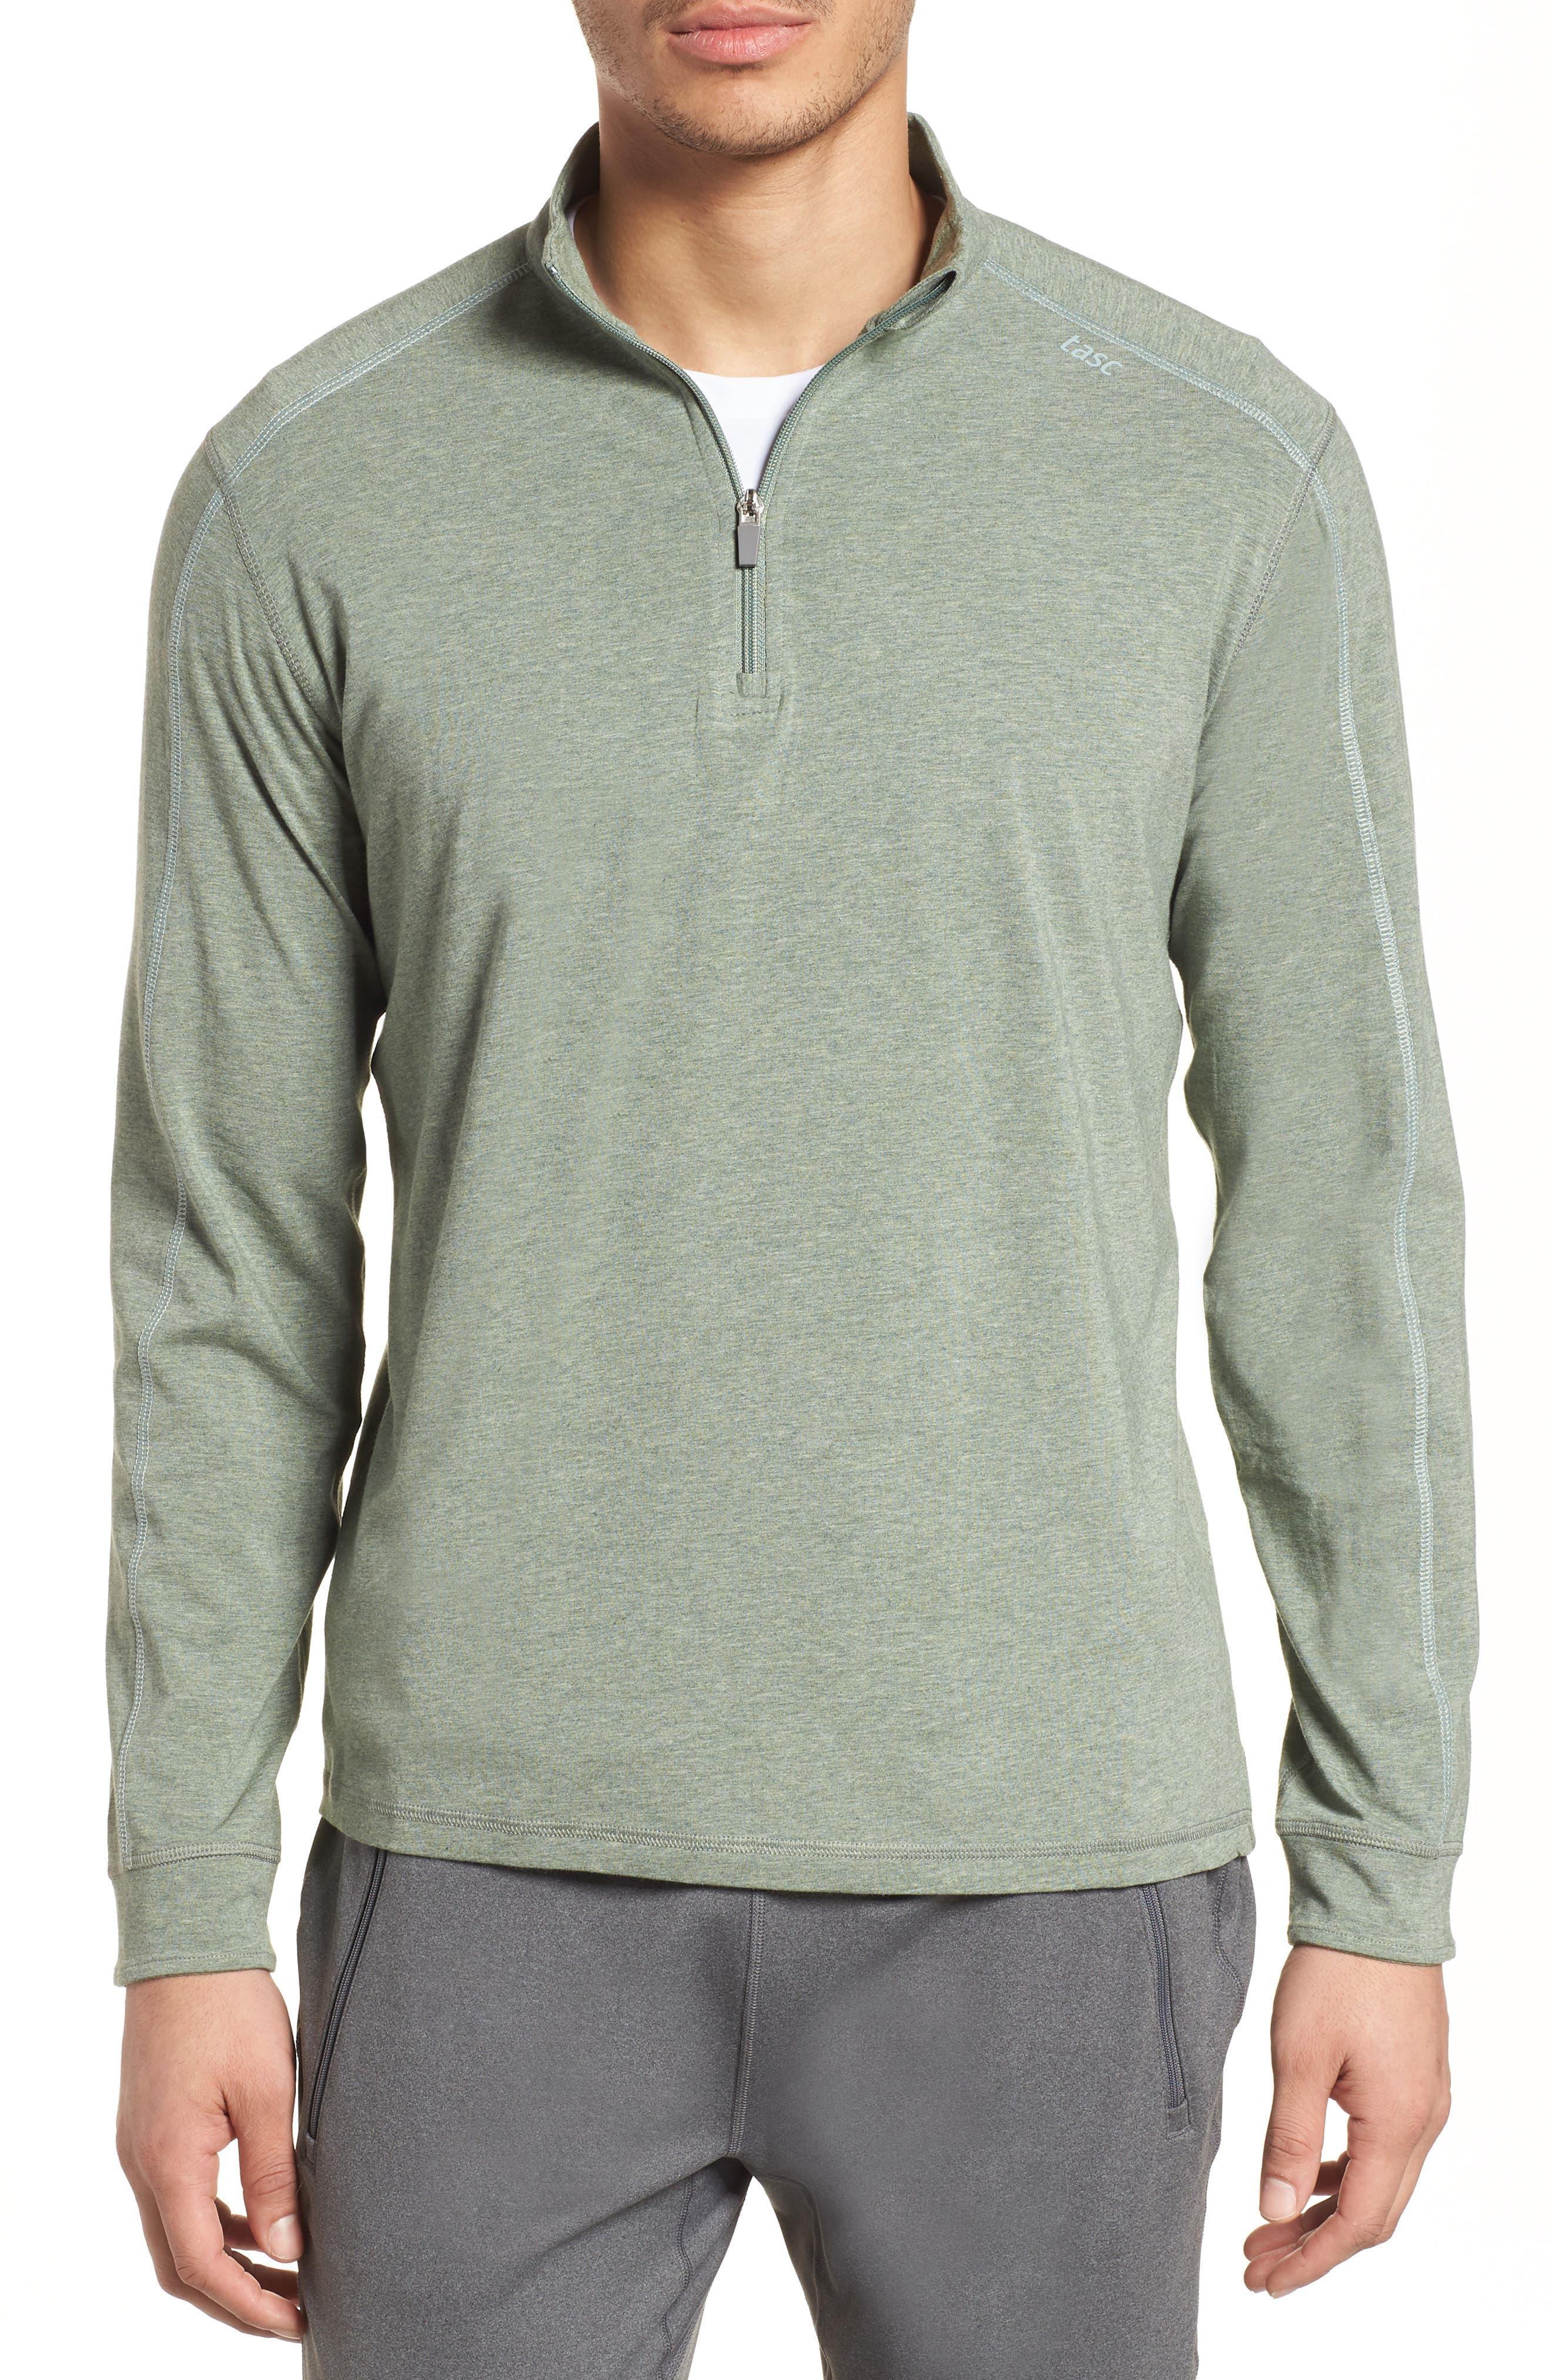 tasc Performance Carrollton Quarter Zip Sweatshirt